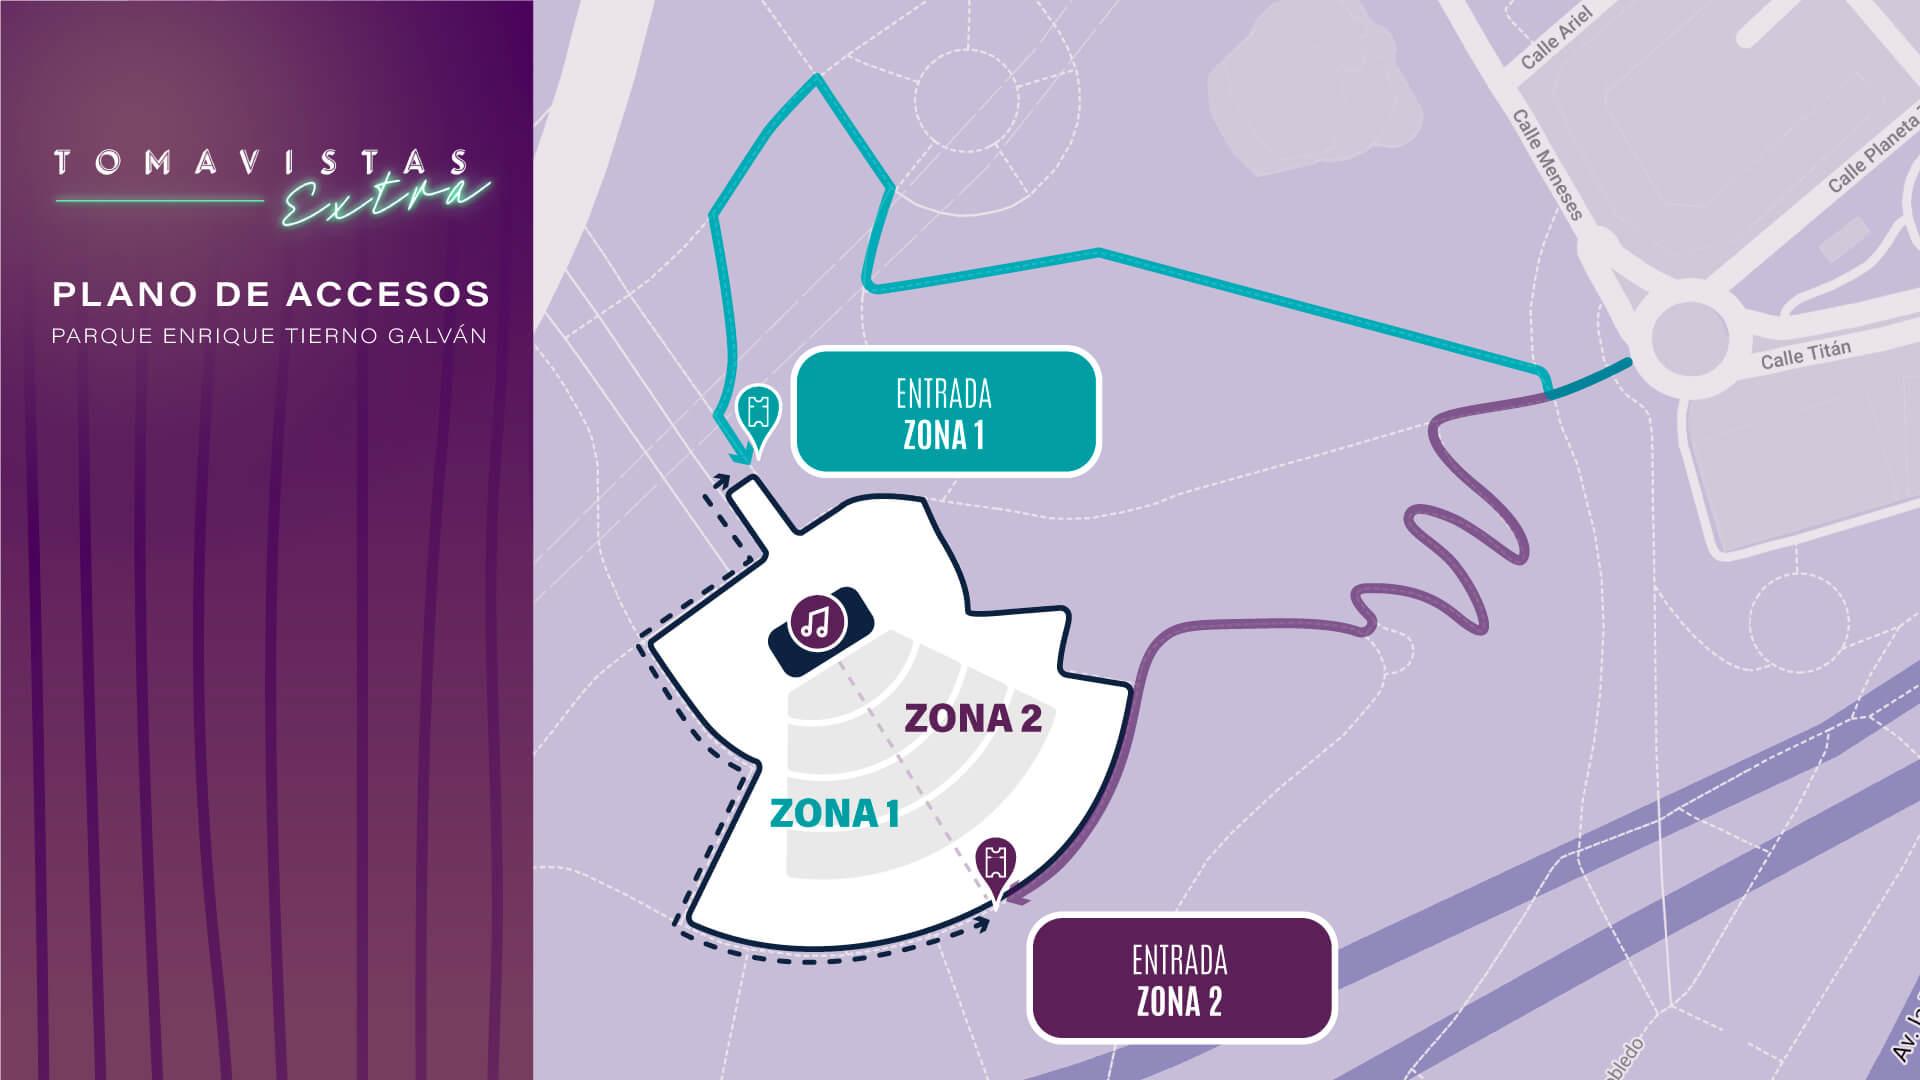 plano accesos Tomavistas Extra 2021